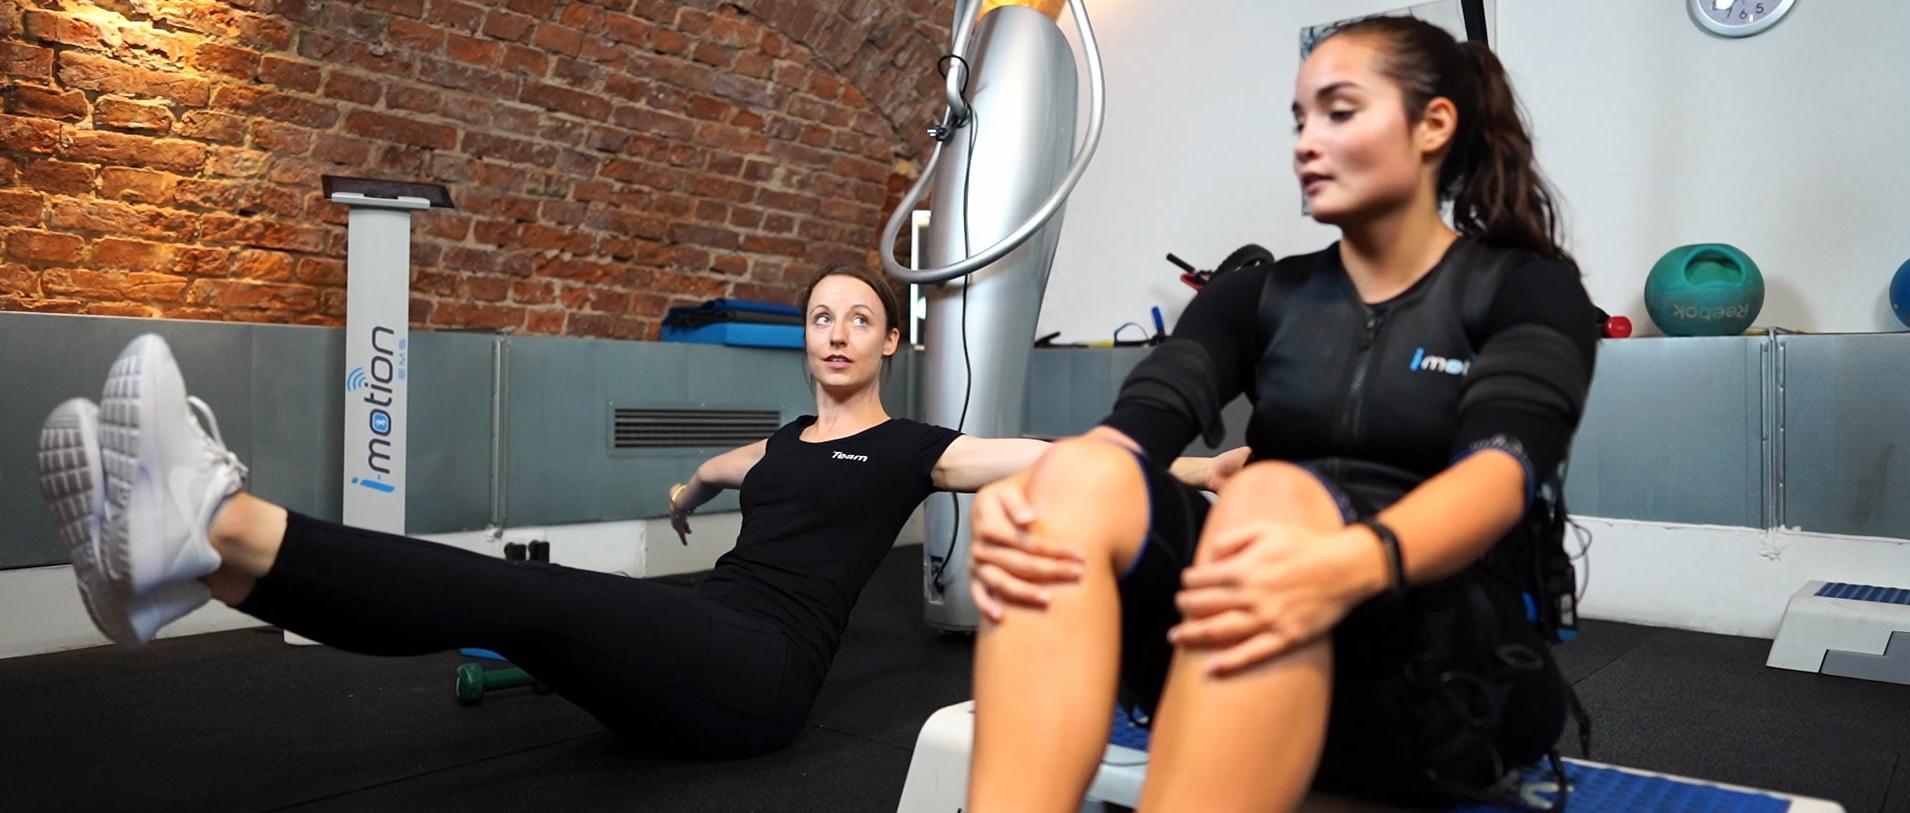 Video 10 Jahre Fitnesslounge Erlangen 2019